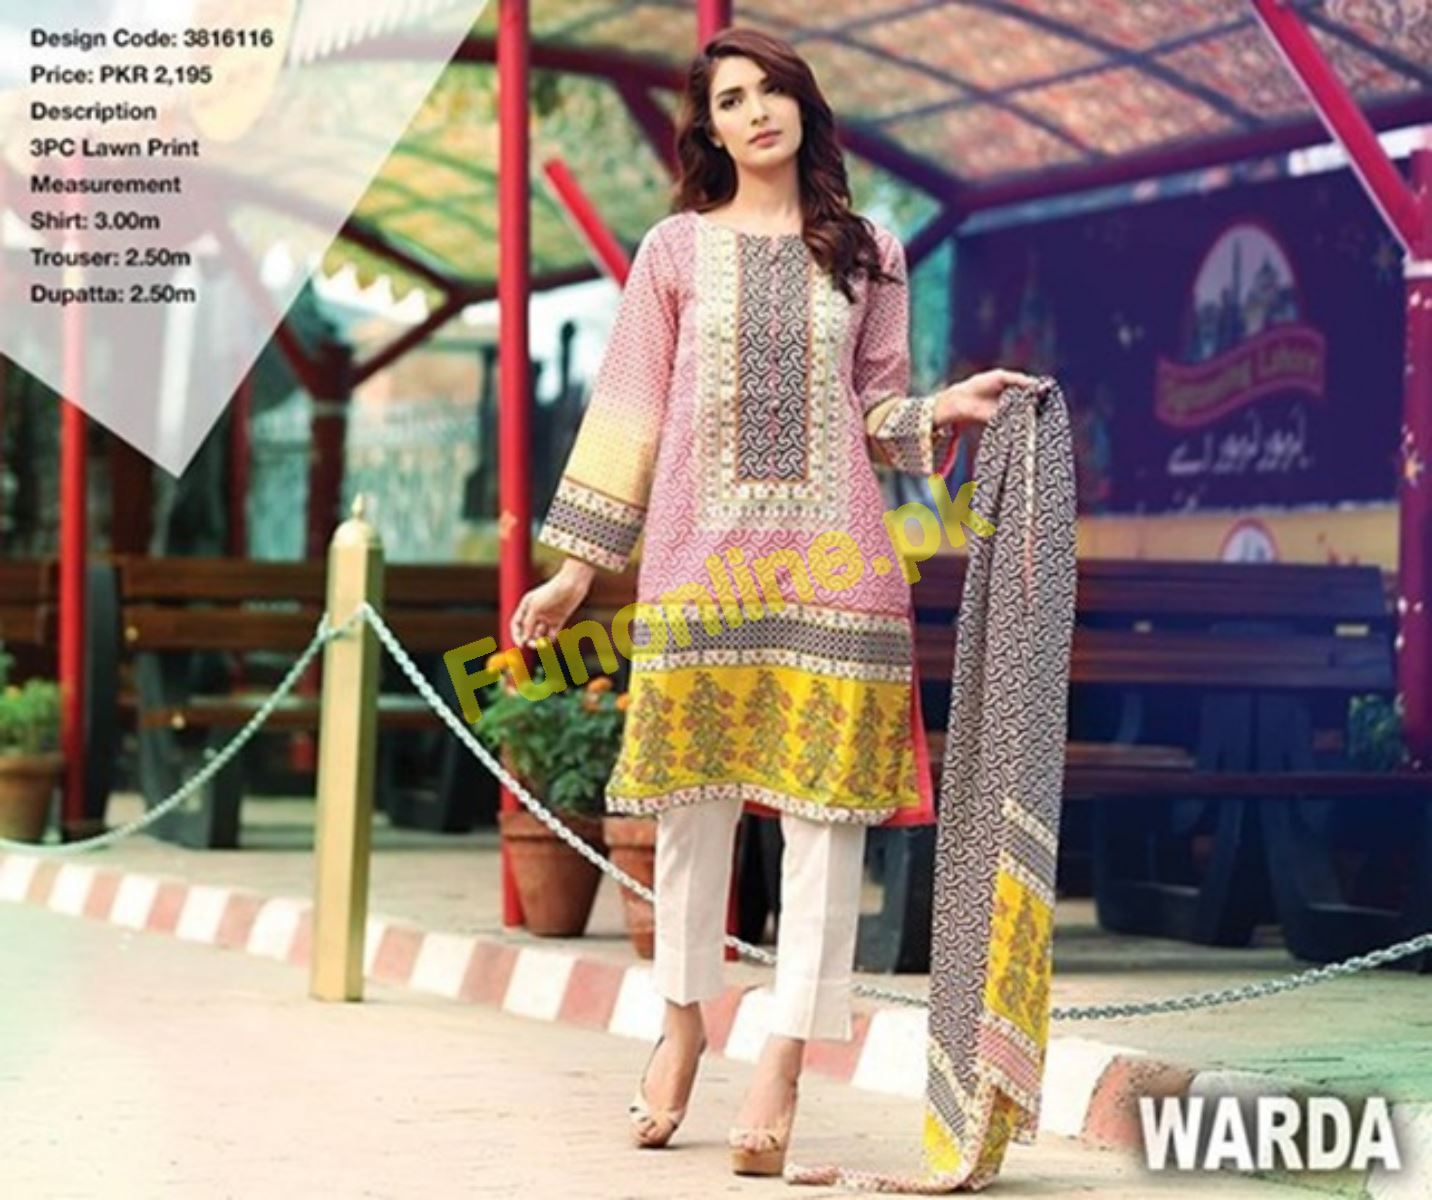 warda beautiful summer dresses collection 2017